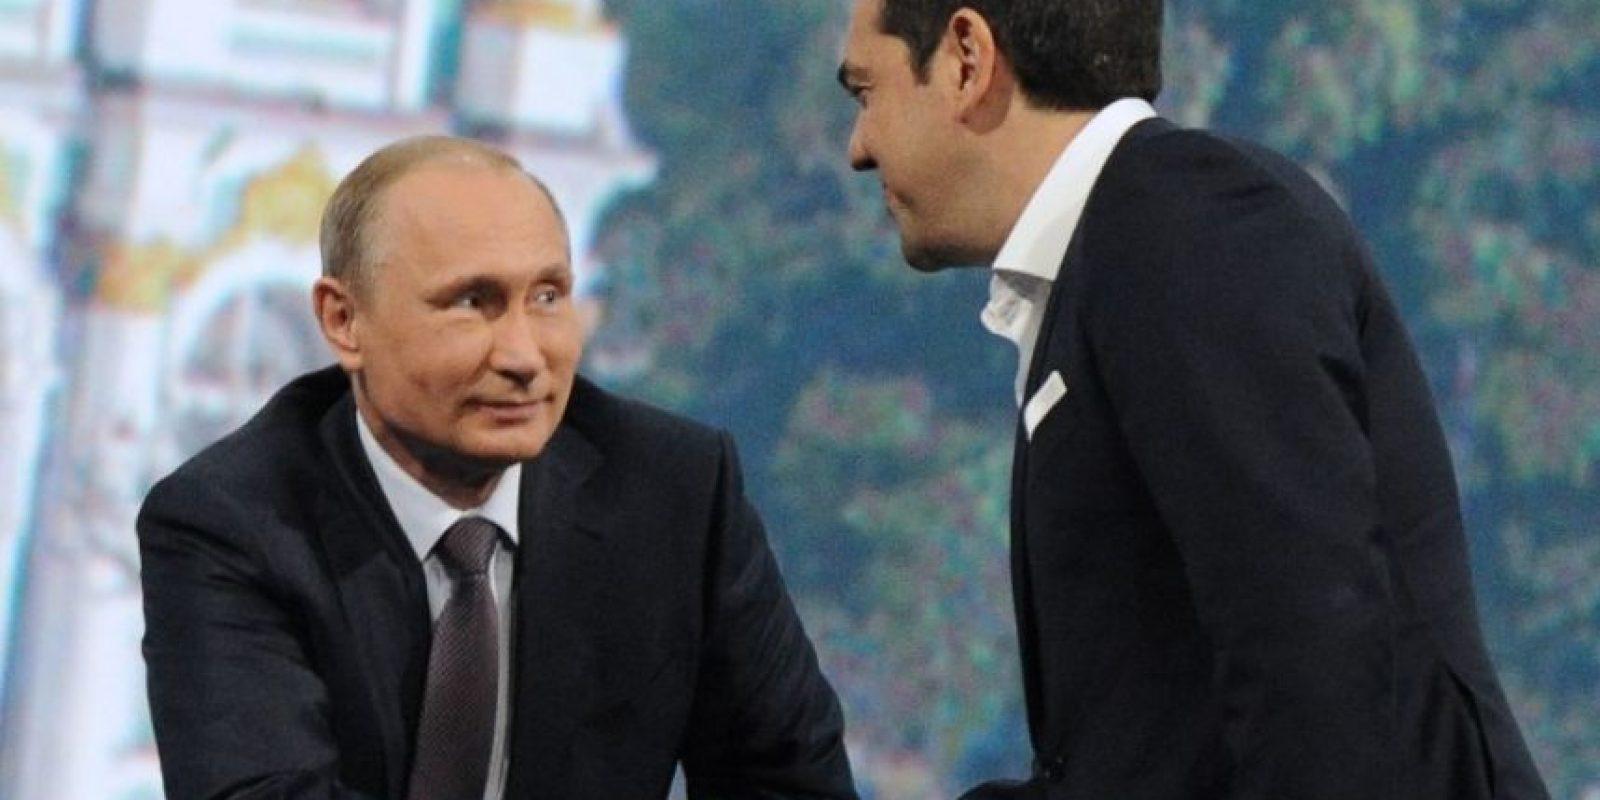 Ocupó cargos como miembro del comité central del partido político Synaspismos Foto:AFP